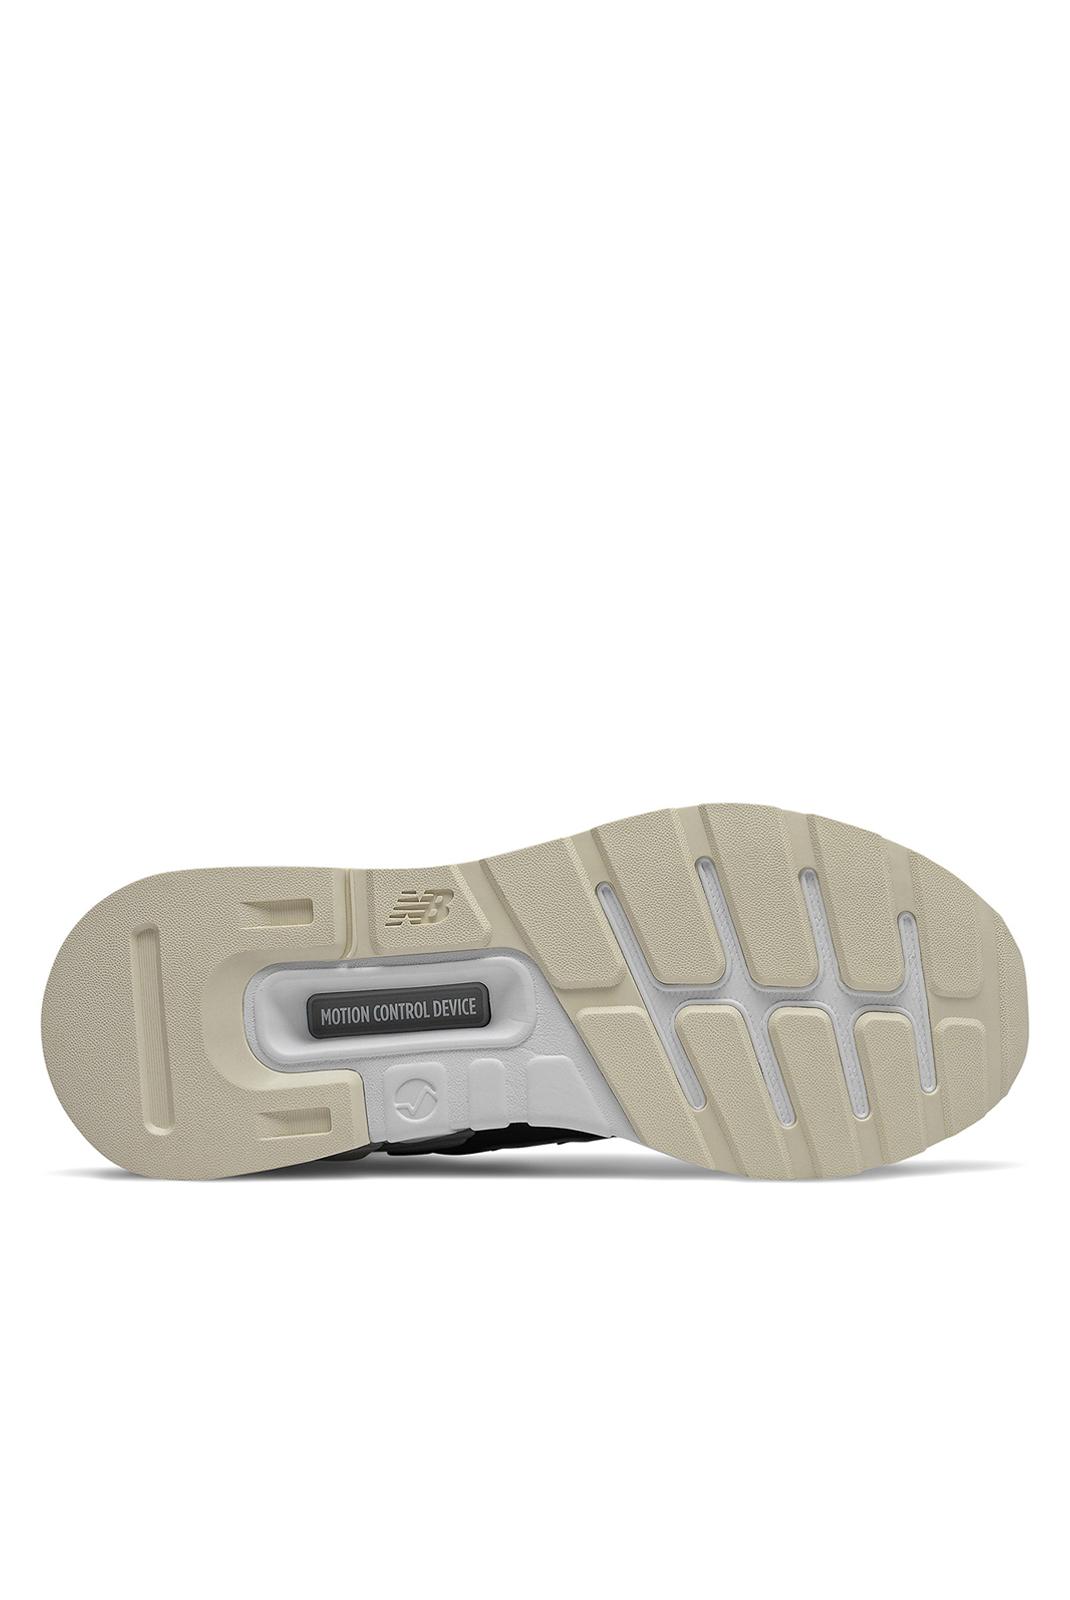 Baskets / Sneakers  New balance WS997GFG NOIR/BEIGE